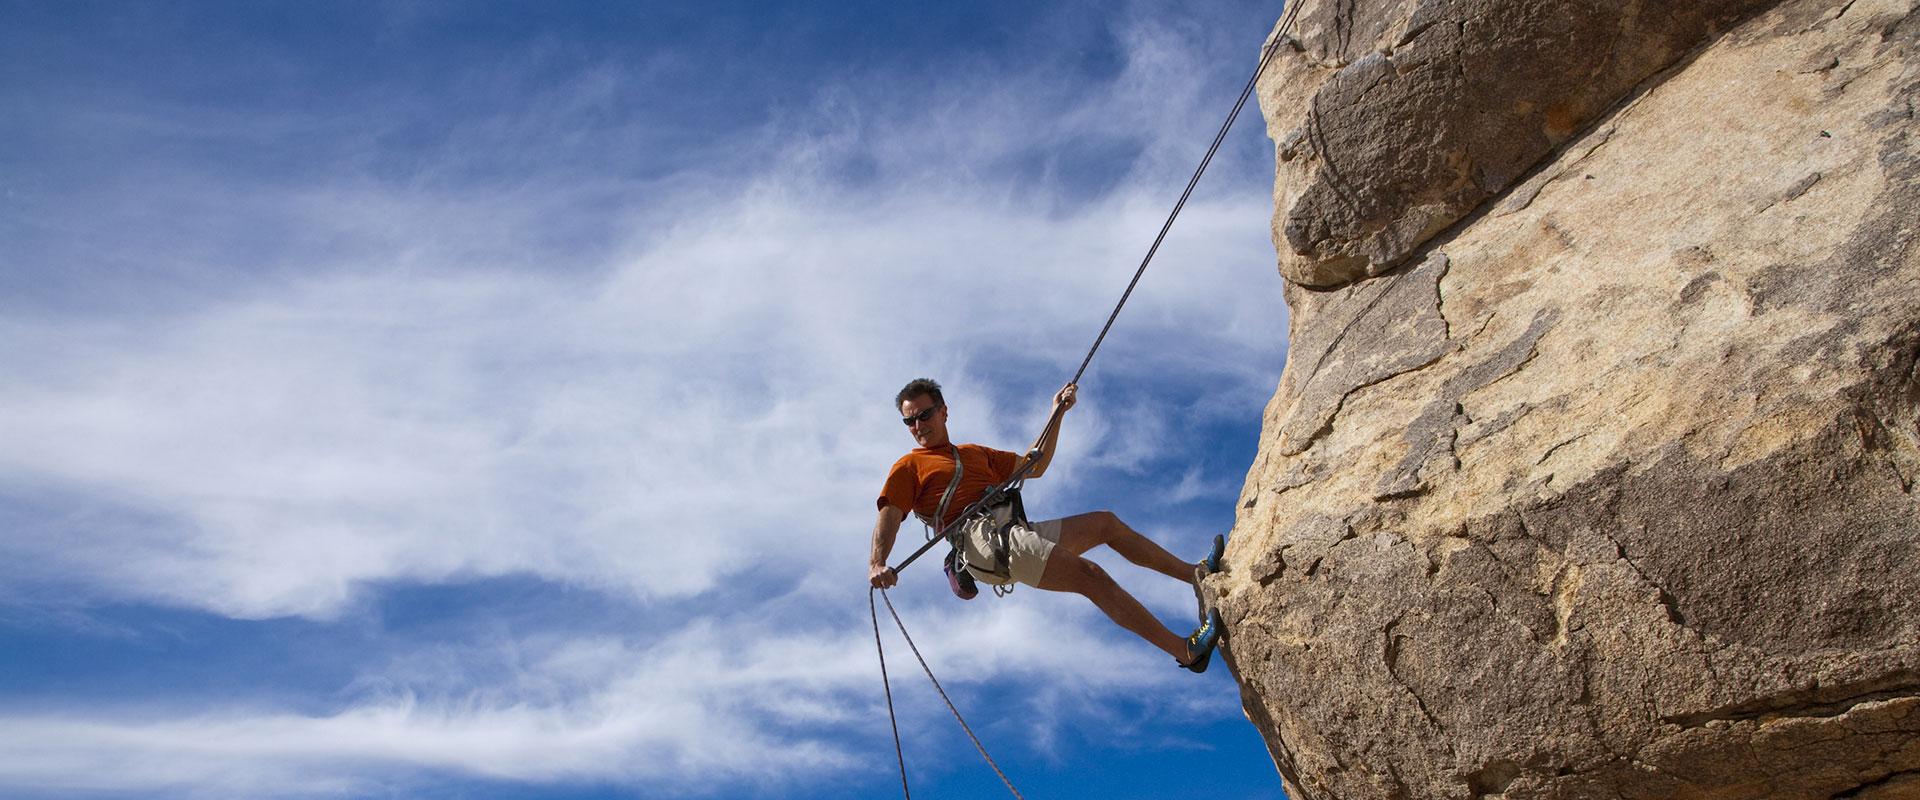 Freeclimbing Isola d'Elba